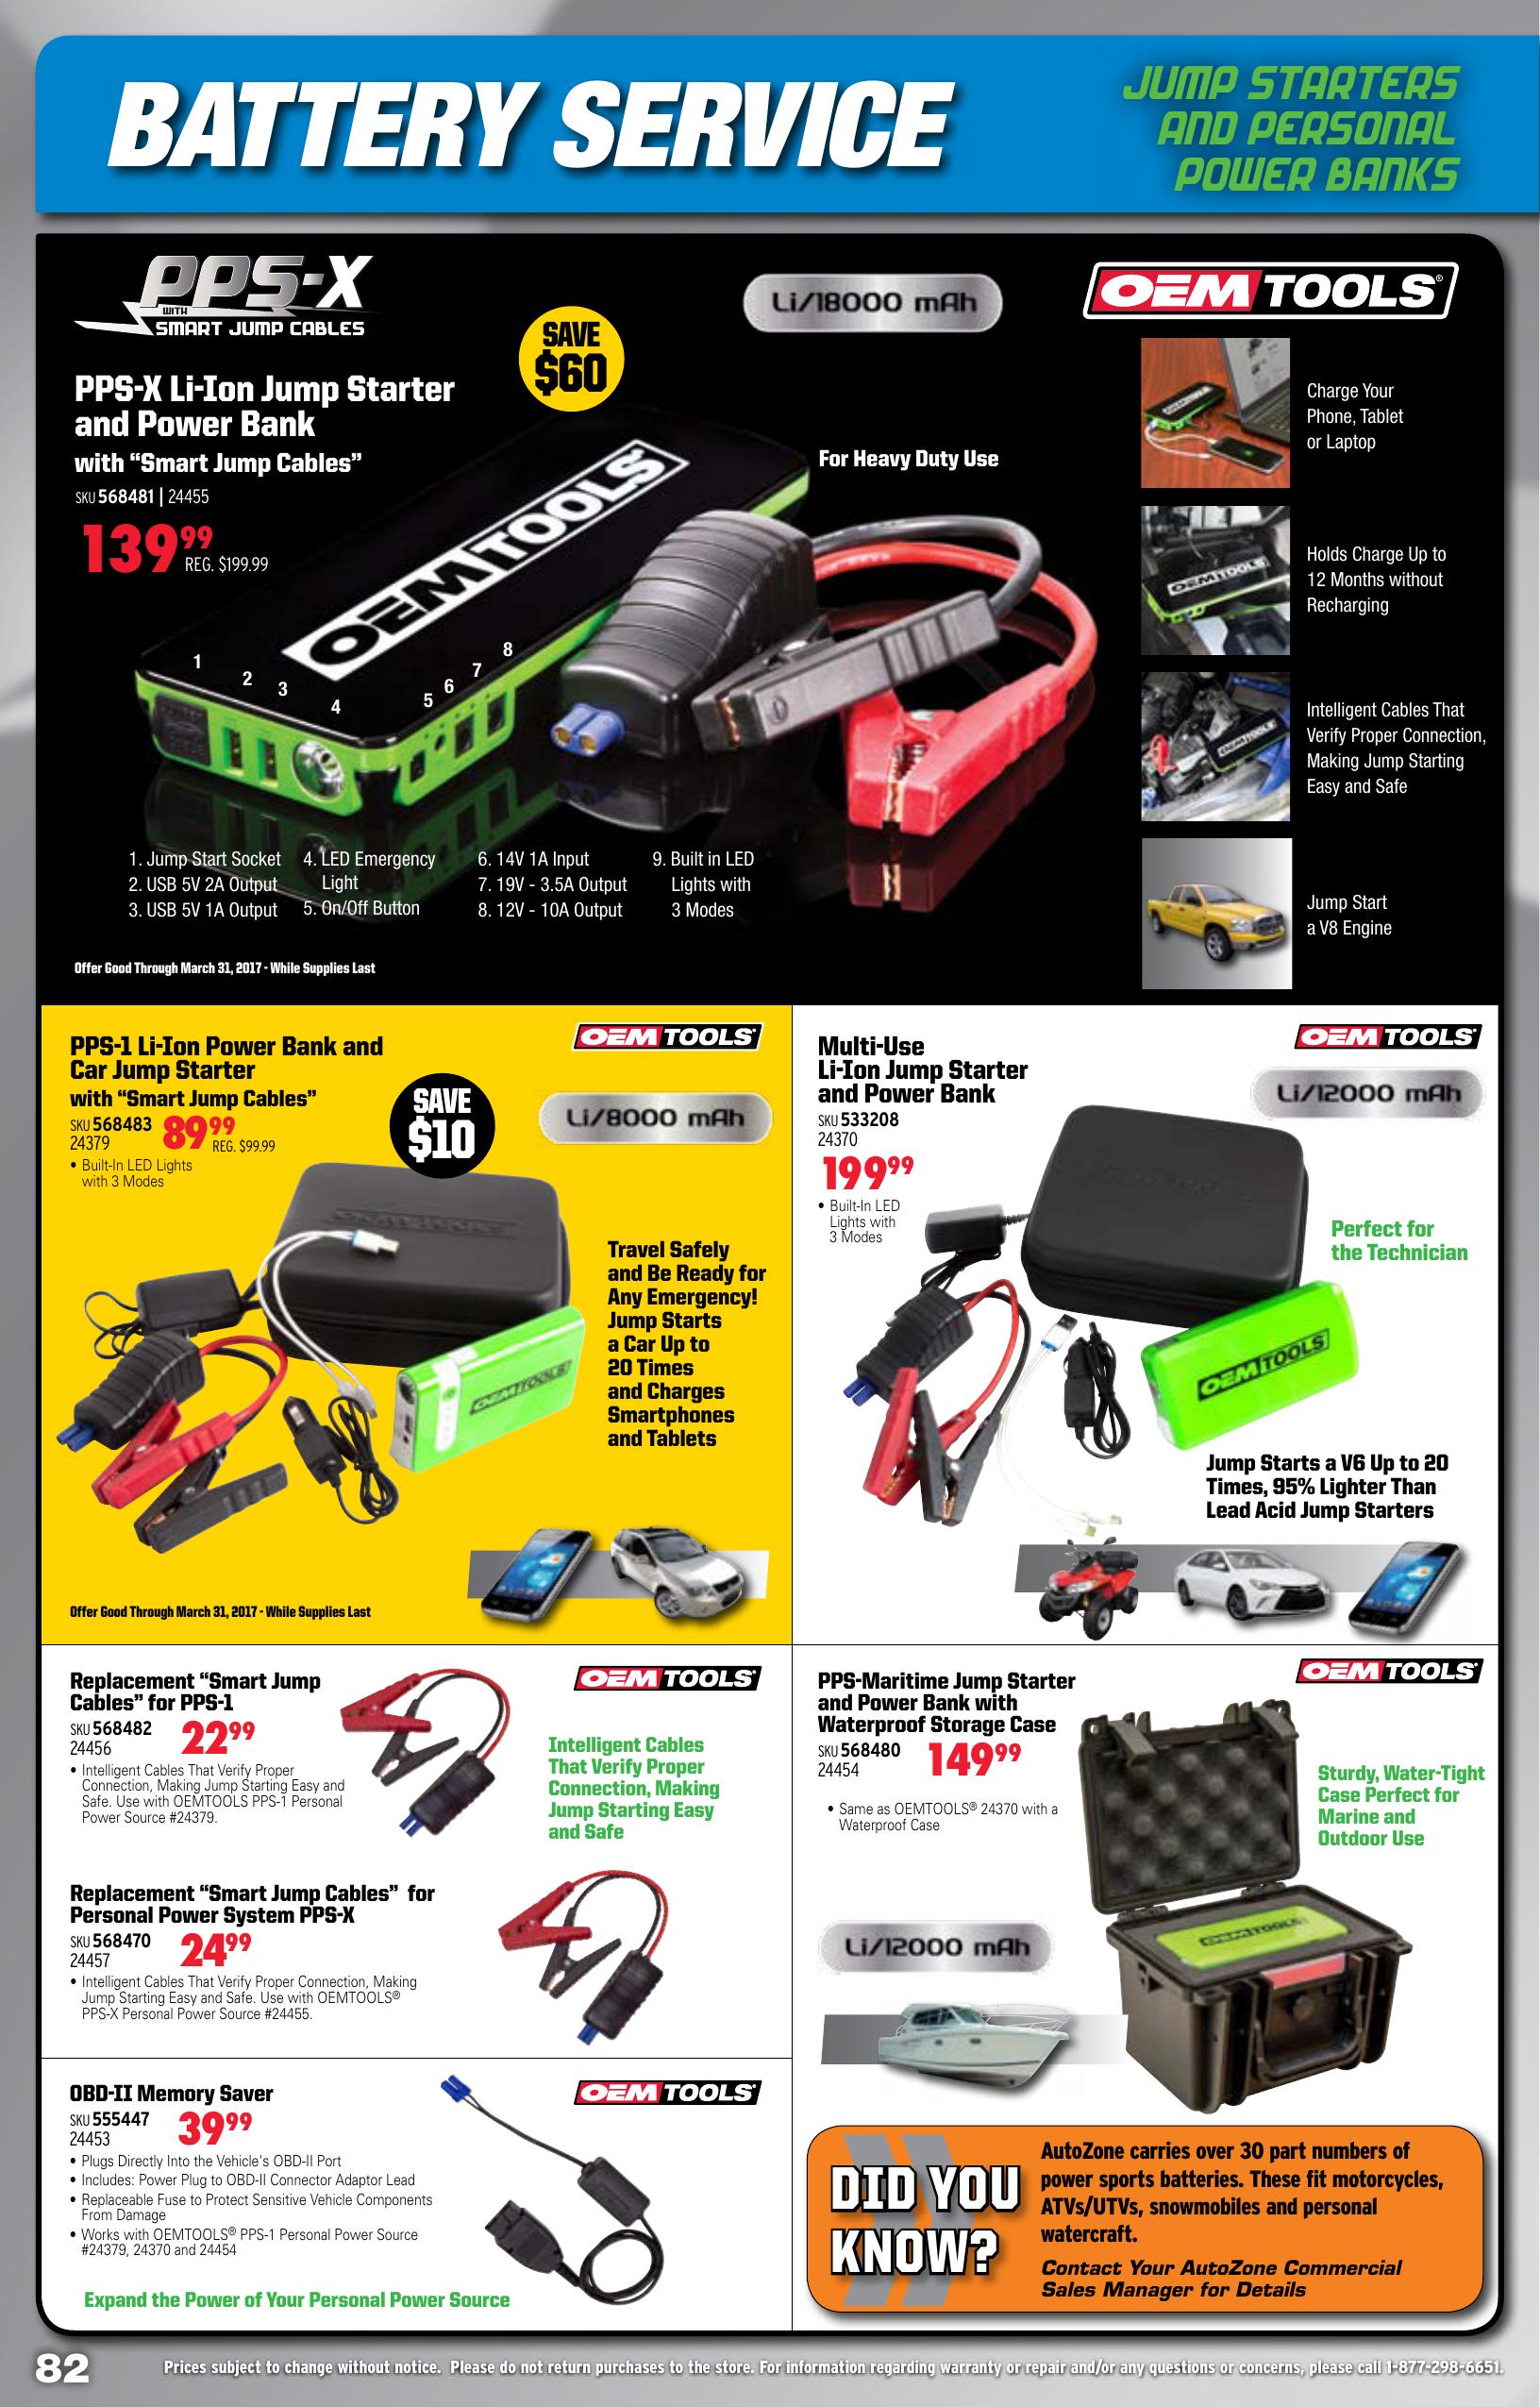 OEMTOOLS 24359 Digital Battery Analyzer 1 Pack